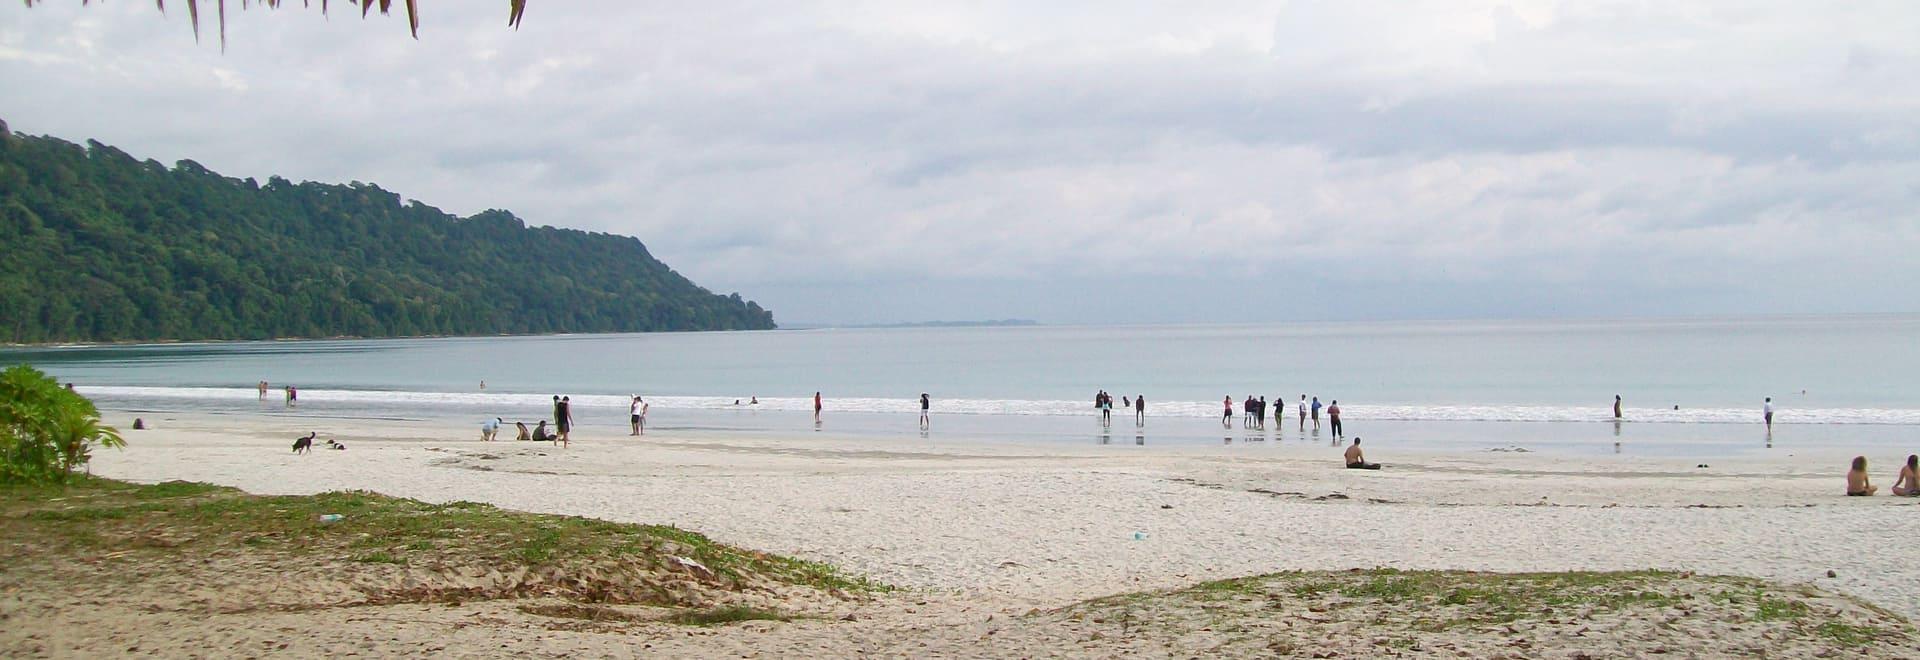 1492612751_radhanagar_beach__havelock_islands__andaman_and_nicobar.jpg